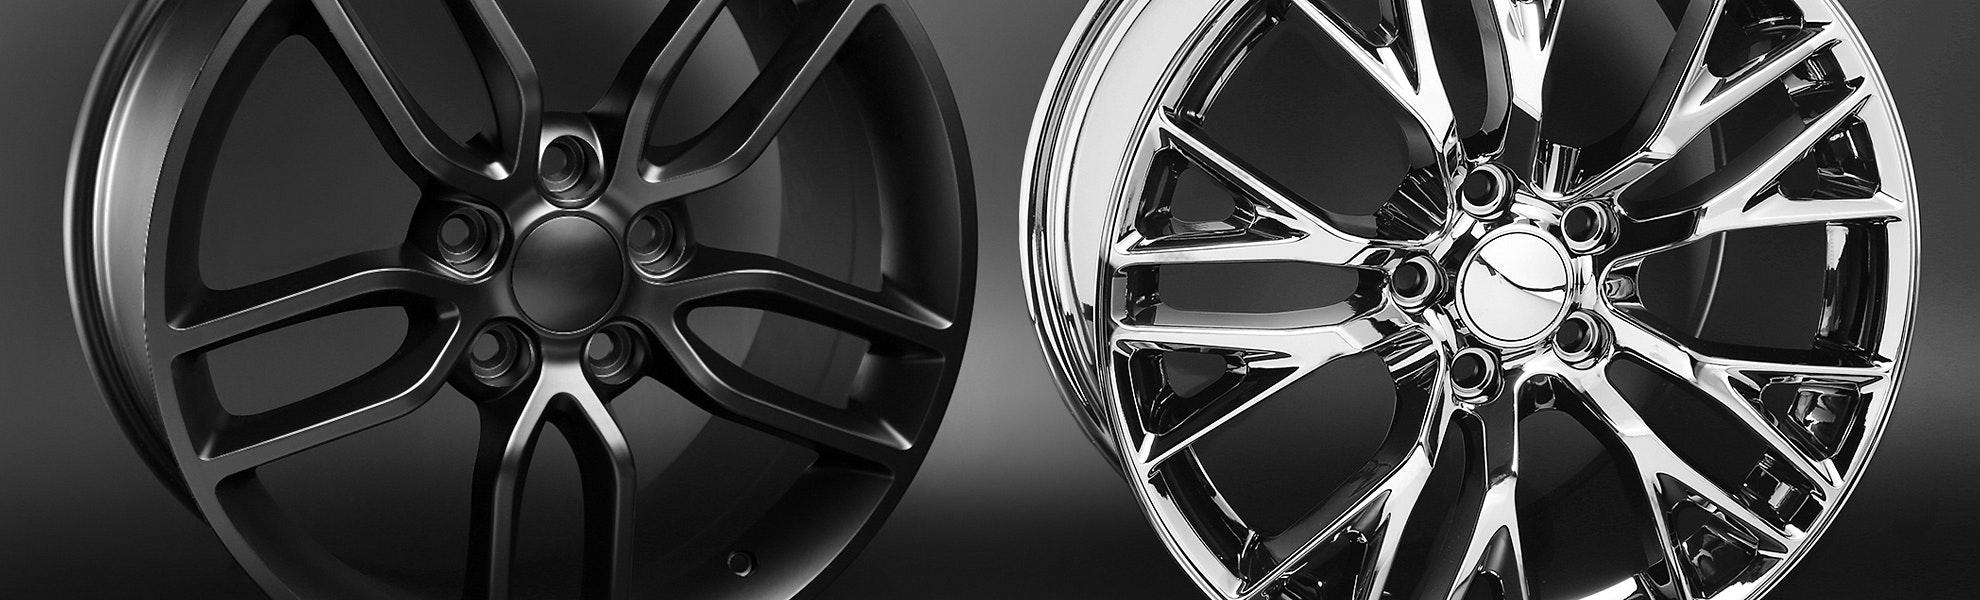 Factory Reproductions Z51/Z06 Wheels (C6/C7)